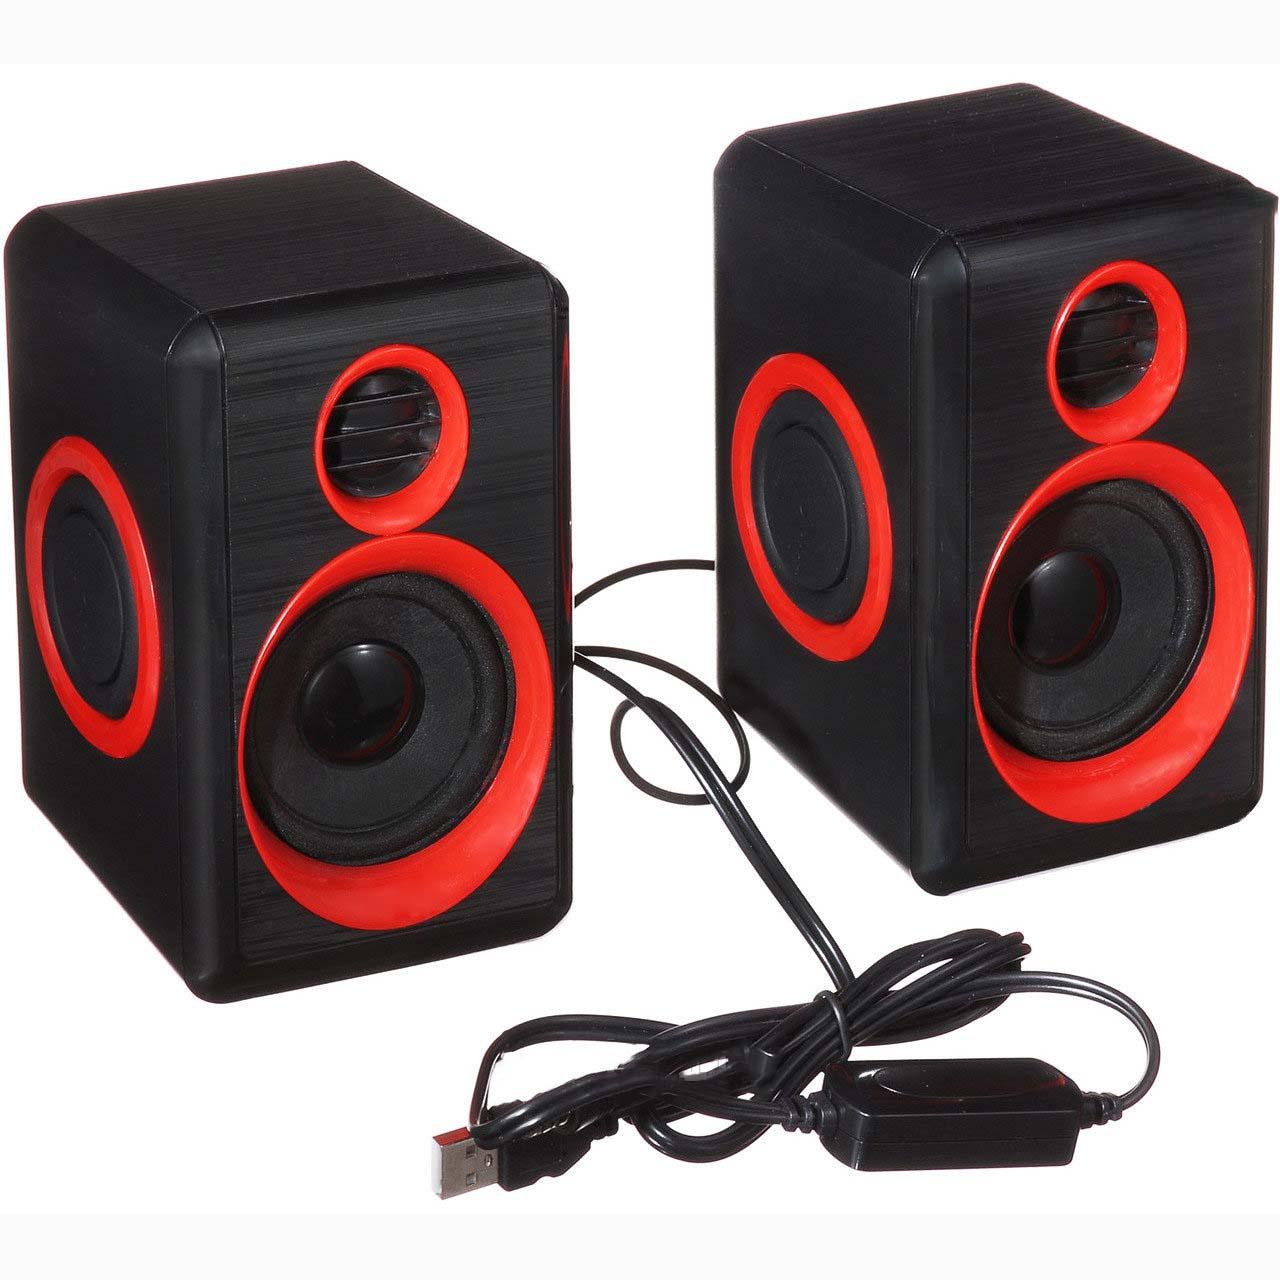 SPEAKER MULTIMEDIA HOTMAI HT-165 USB 3W ,Speakers